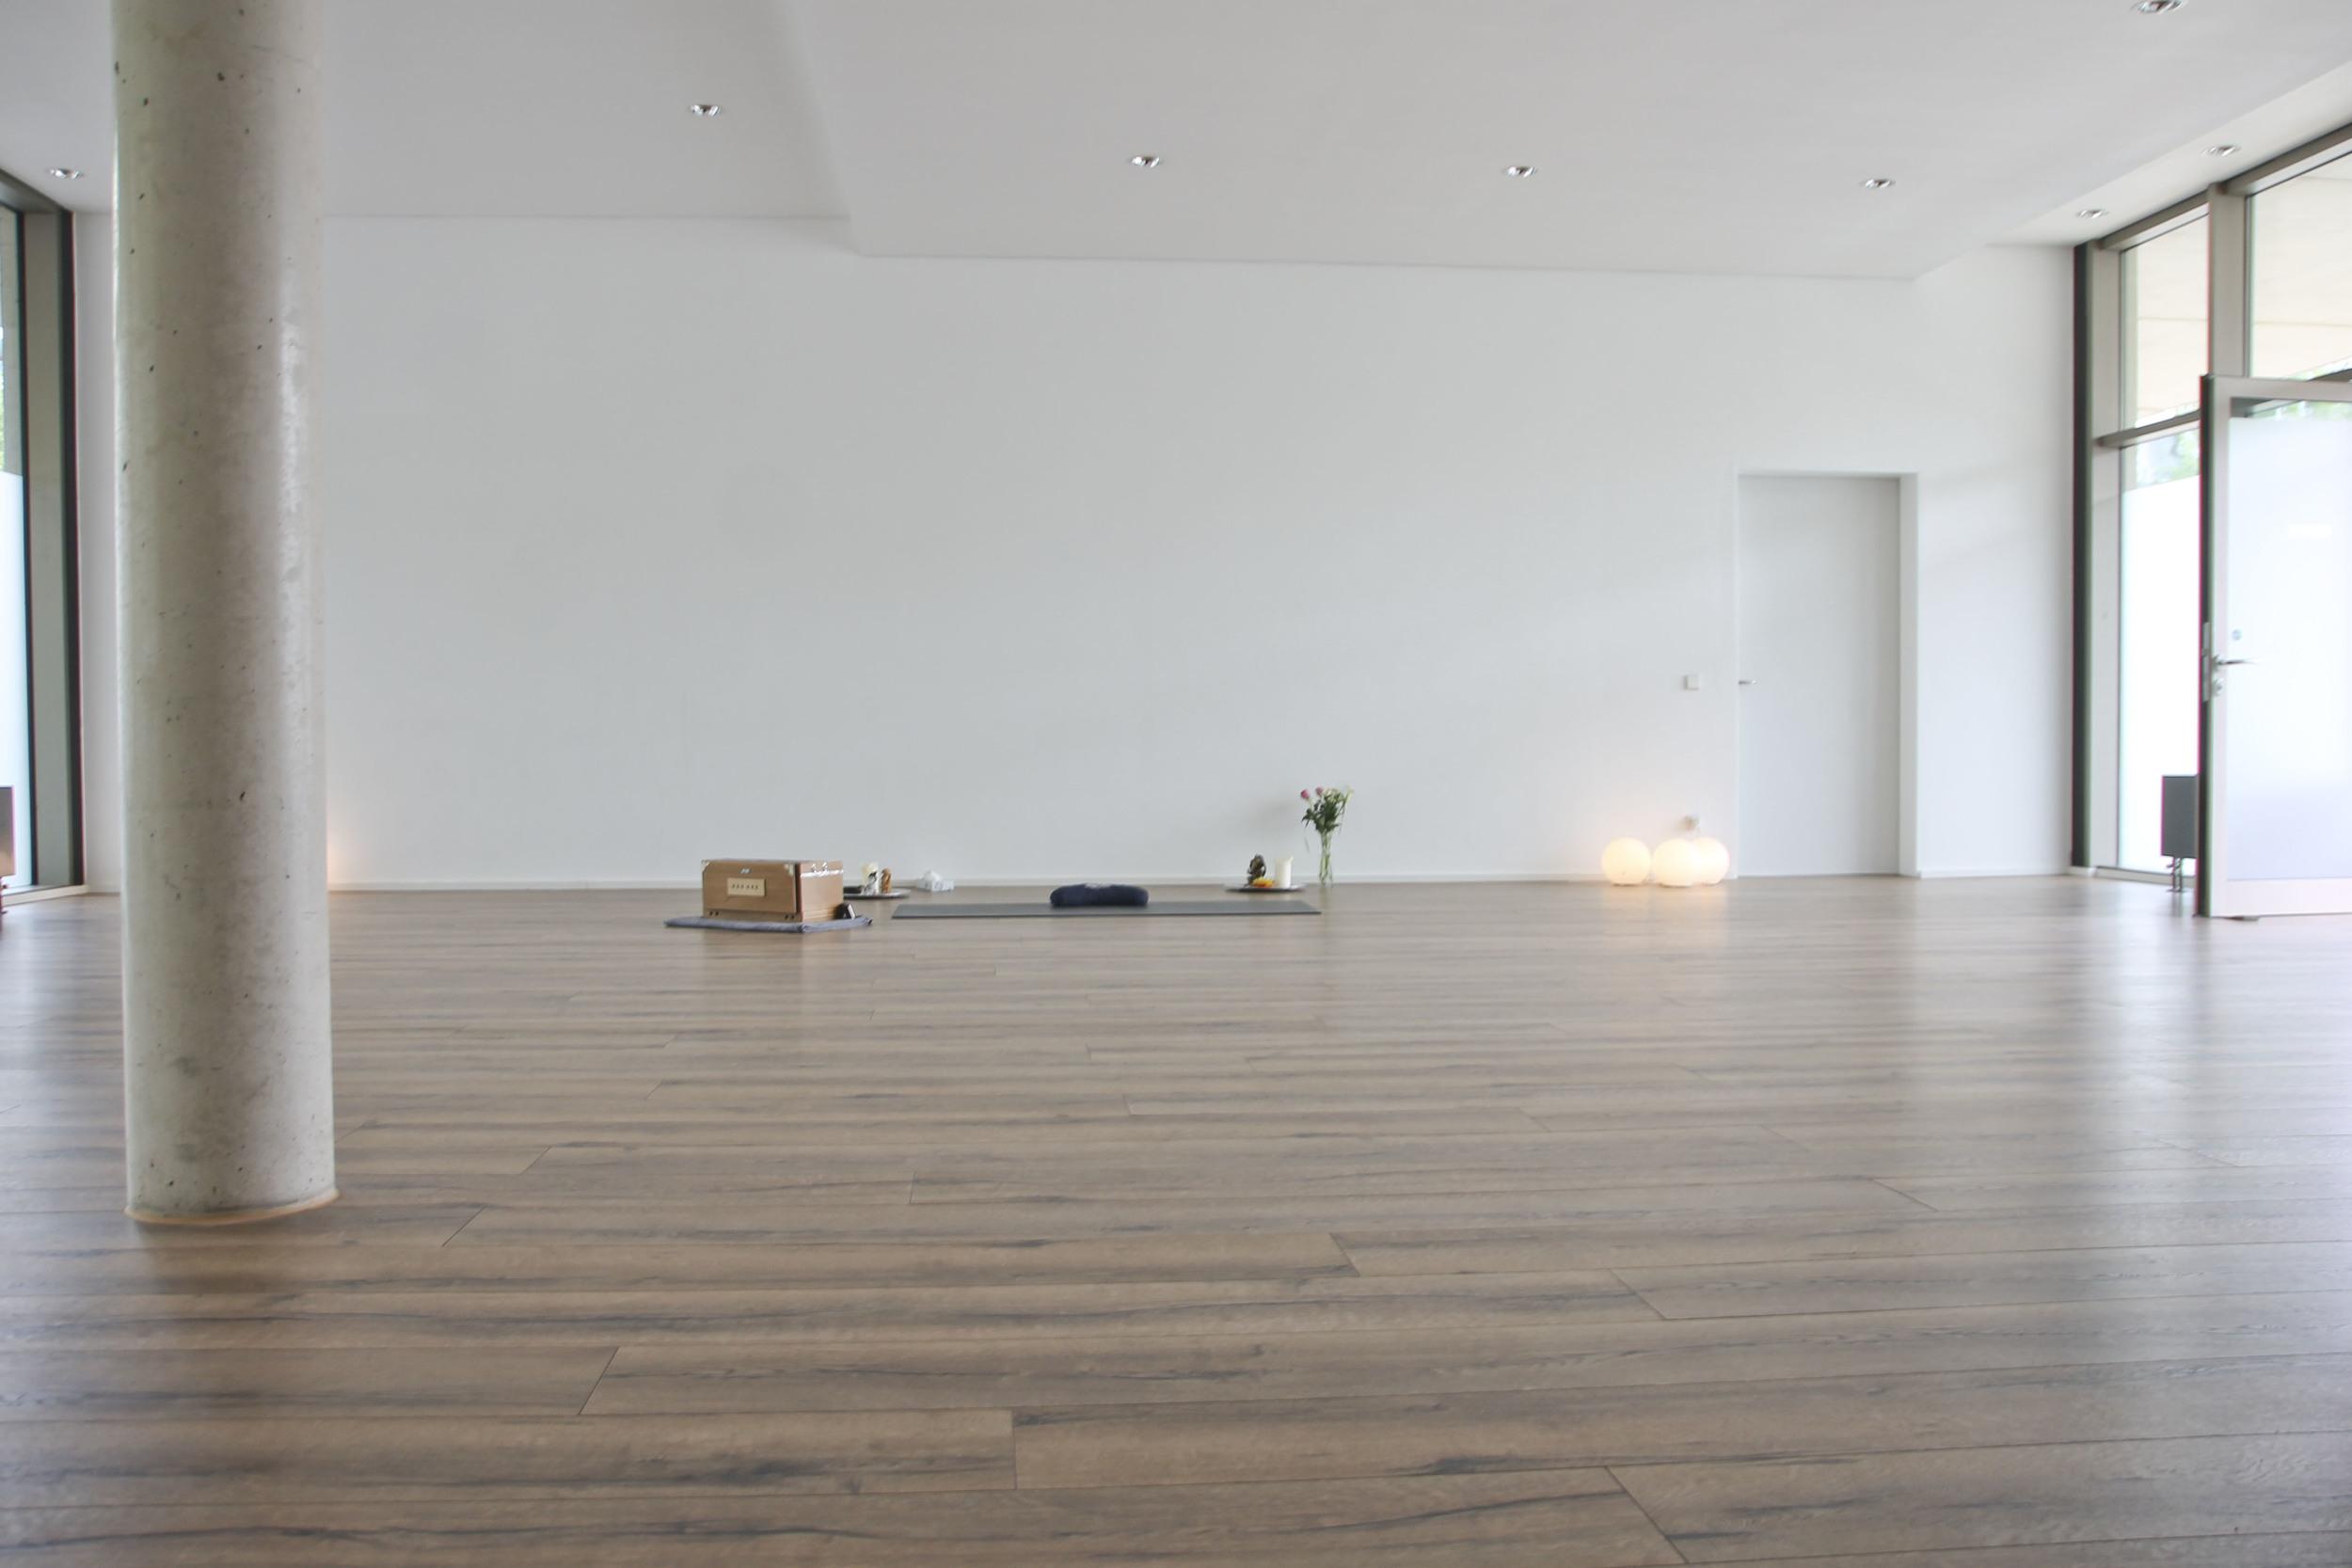 Yoga am Engel, Bogenhausen, Yoga Studio, München3417.jpg